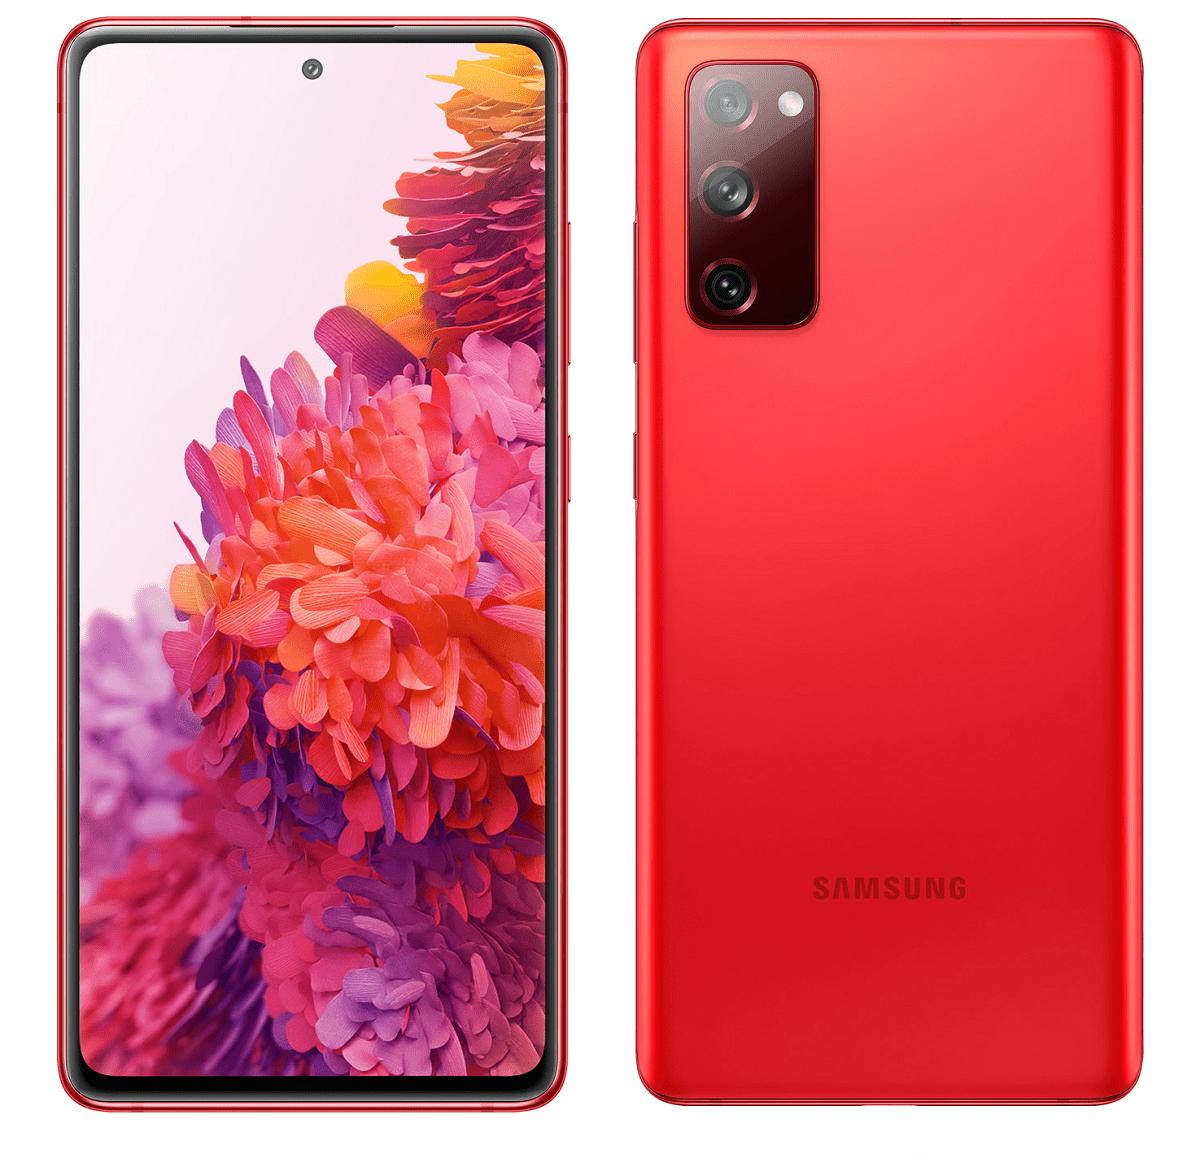 "Smartphone Samsung Galaxy S20 FE 128GB Cloud Red 4G Tela 6.5"" Câmera Frontal 32MP Android 6.6"